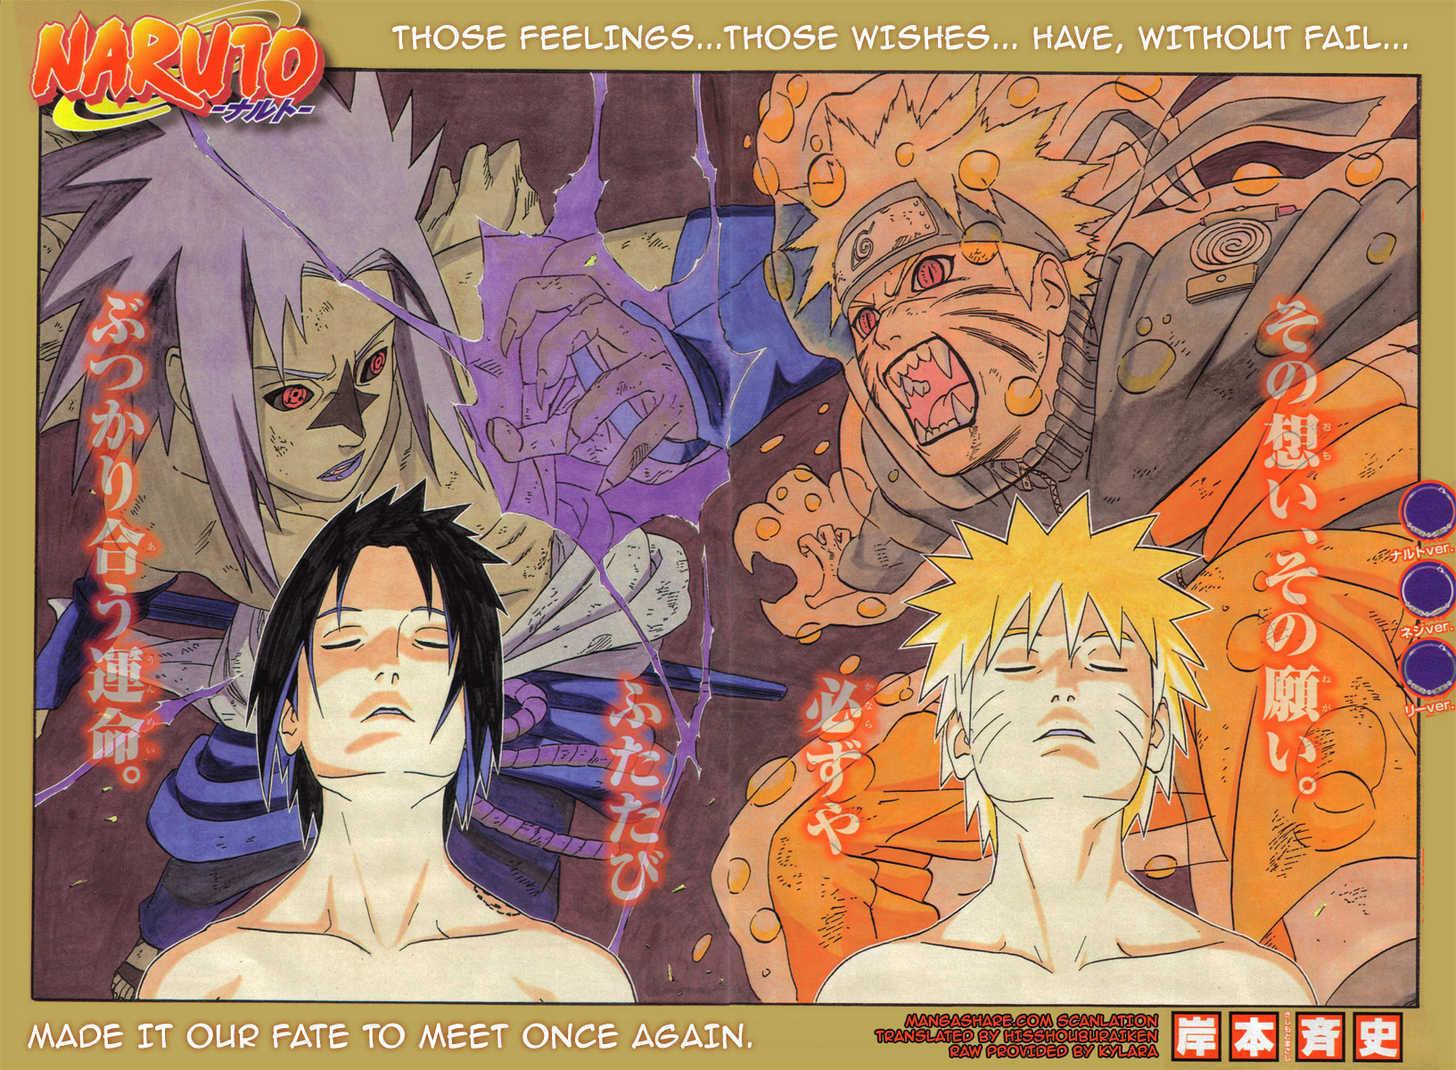 https://im.nineanime.com/comics/pic9/33/289/22744/Naruto3640274.jpg Page 1